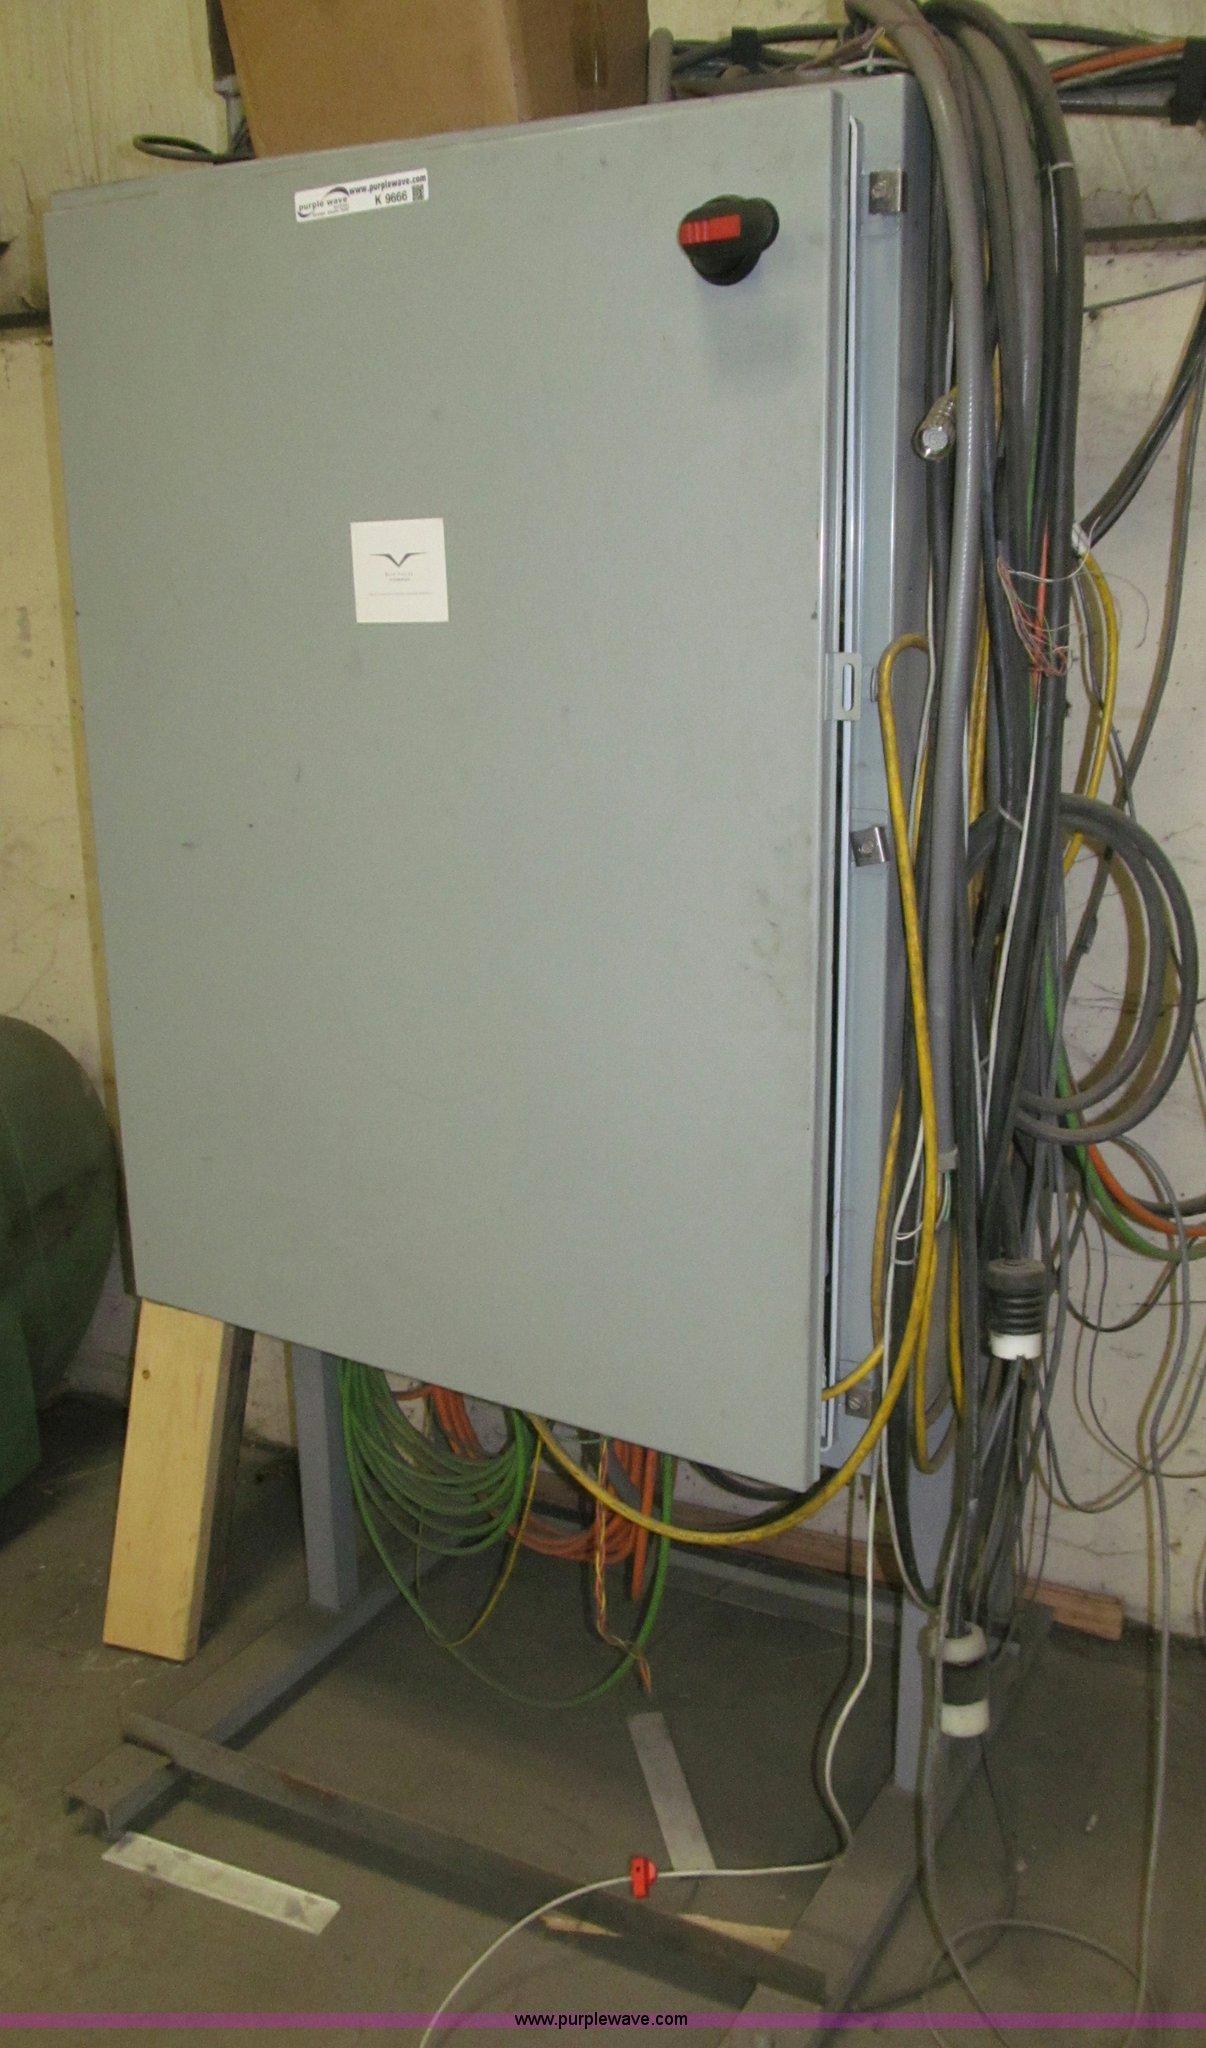 2) freestanding electrical panel box | Item K9666 | SOLD! W...